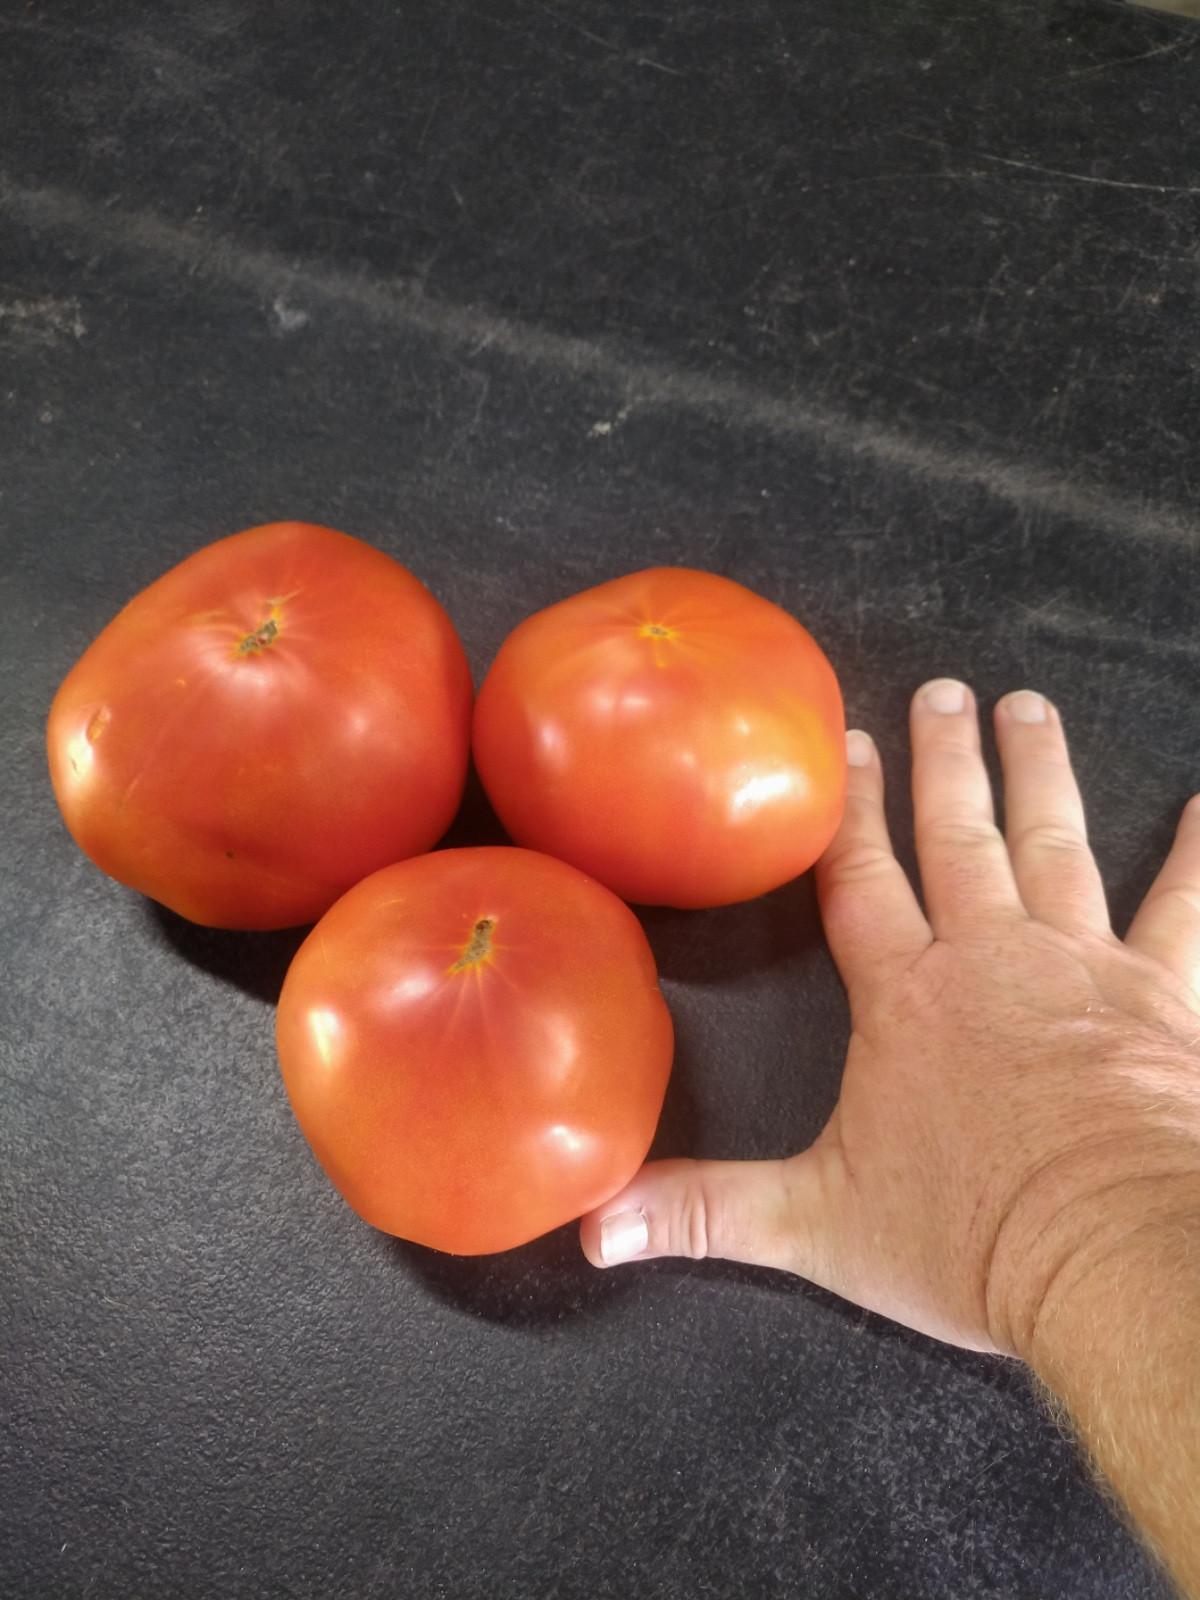 3 extra large vine ripe tomatoes